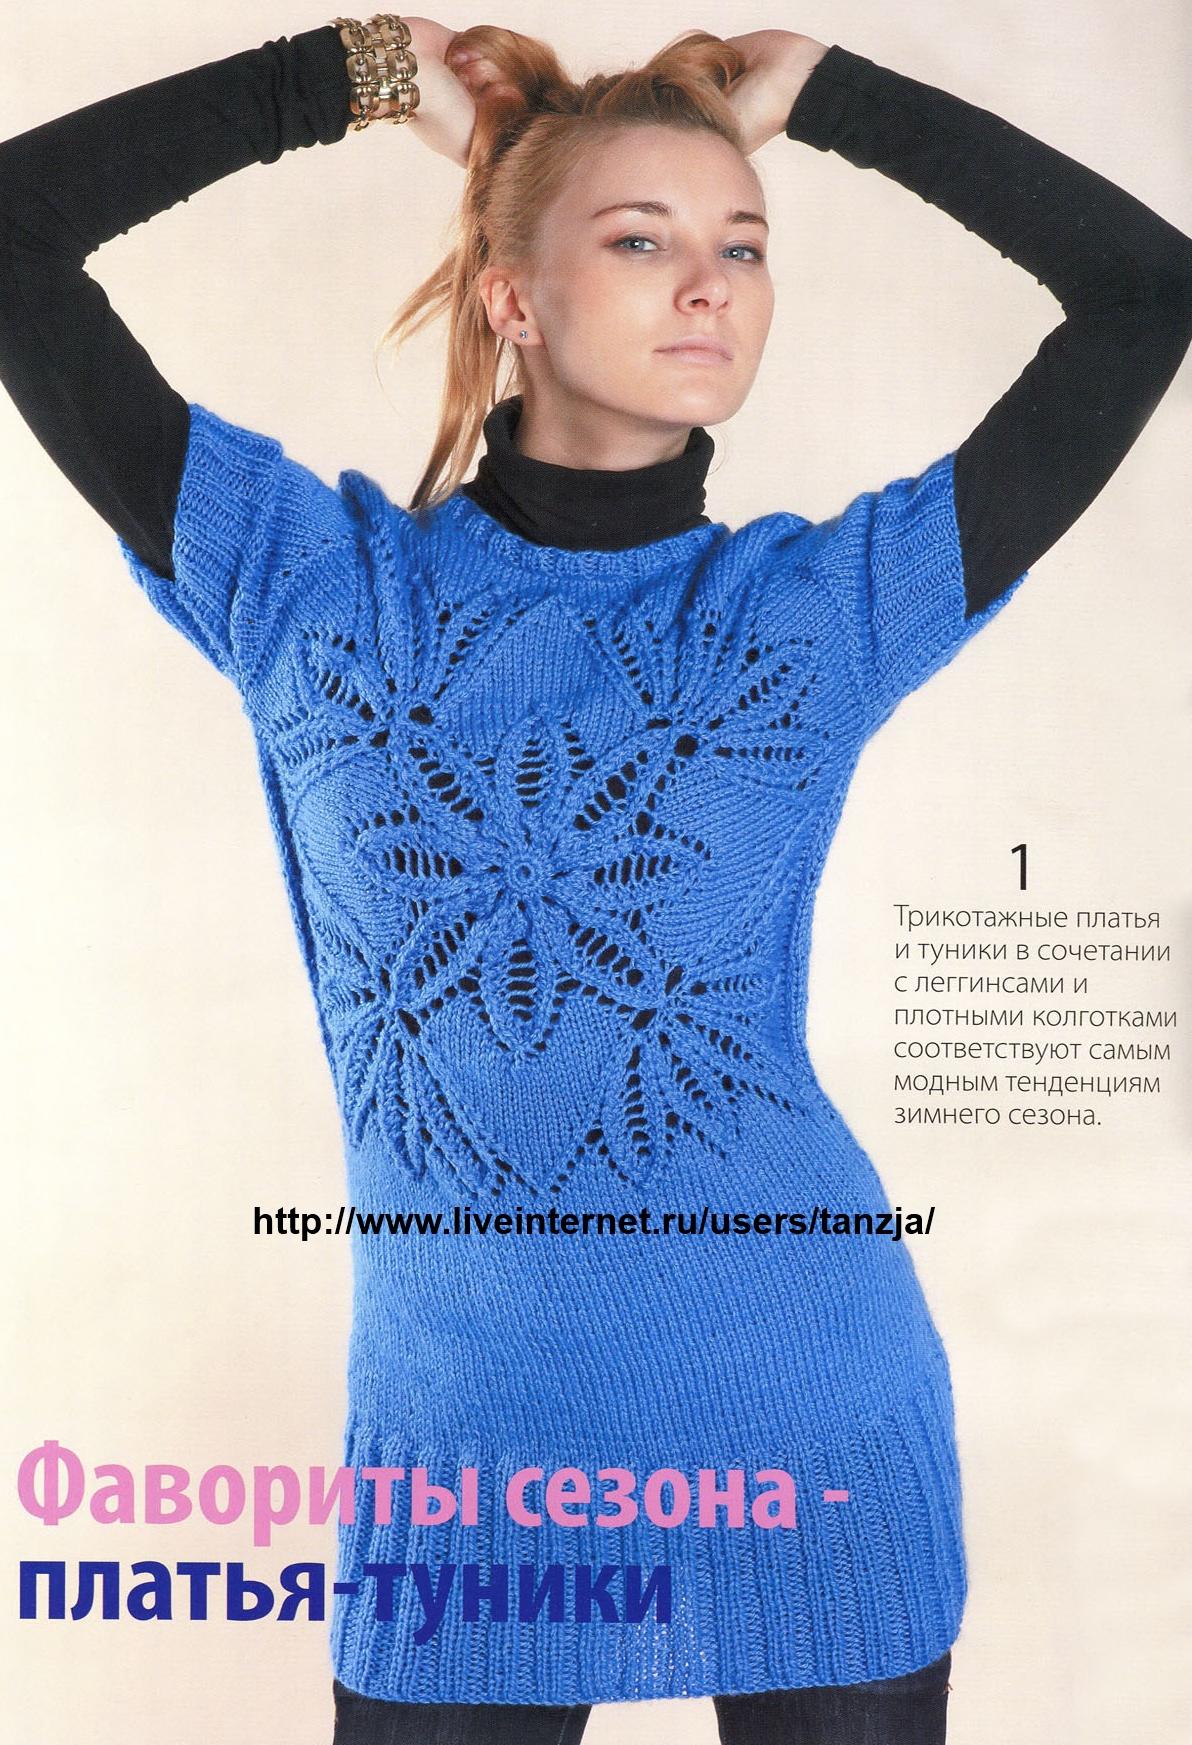 Метки: платья спицами вязаные платья вязание платья платья платье туники туника туники спицами вязаные